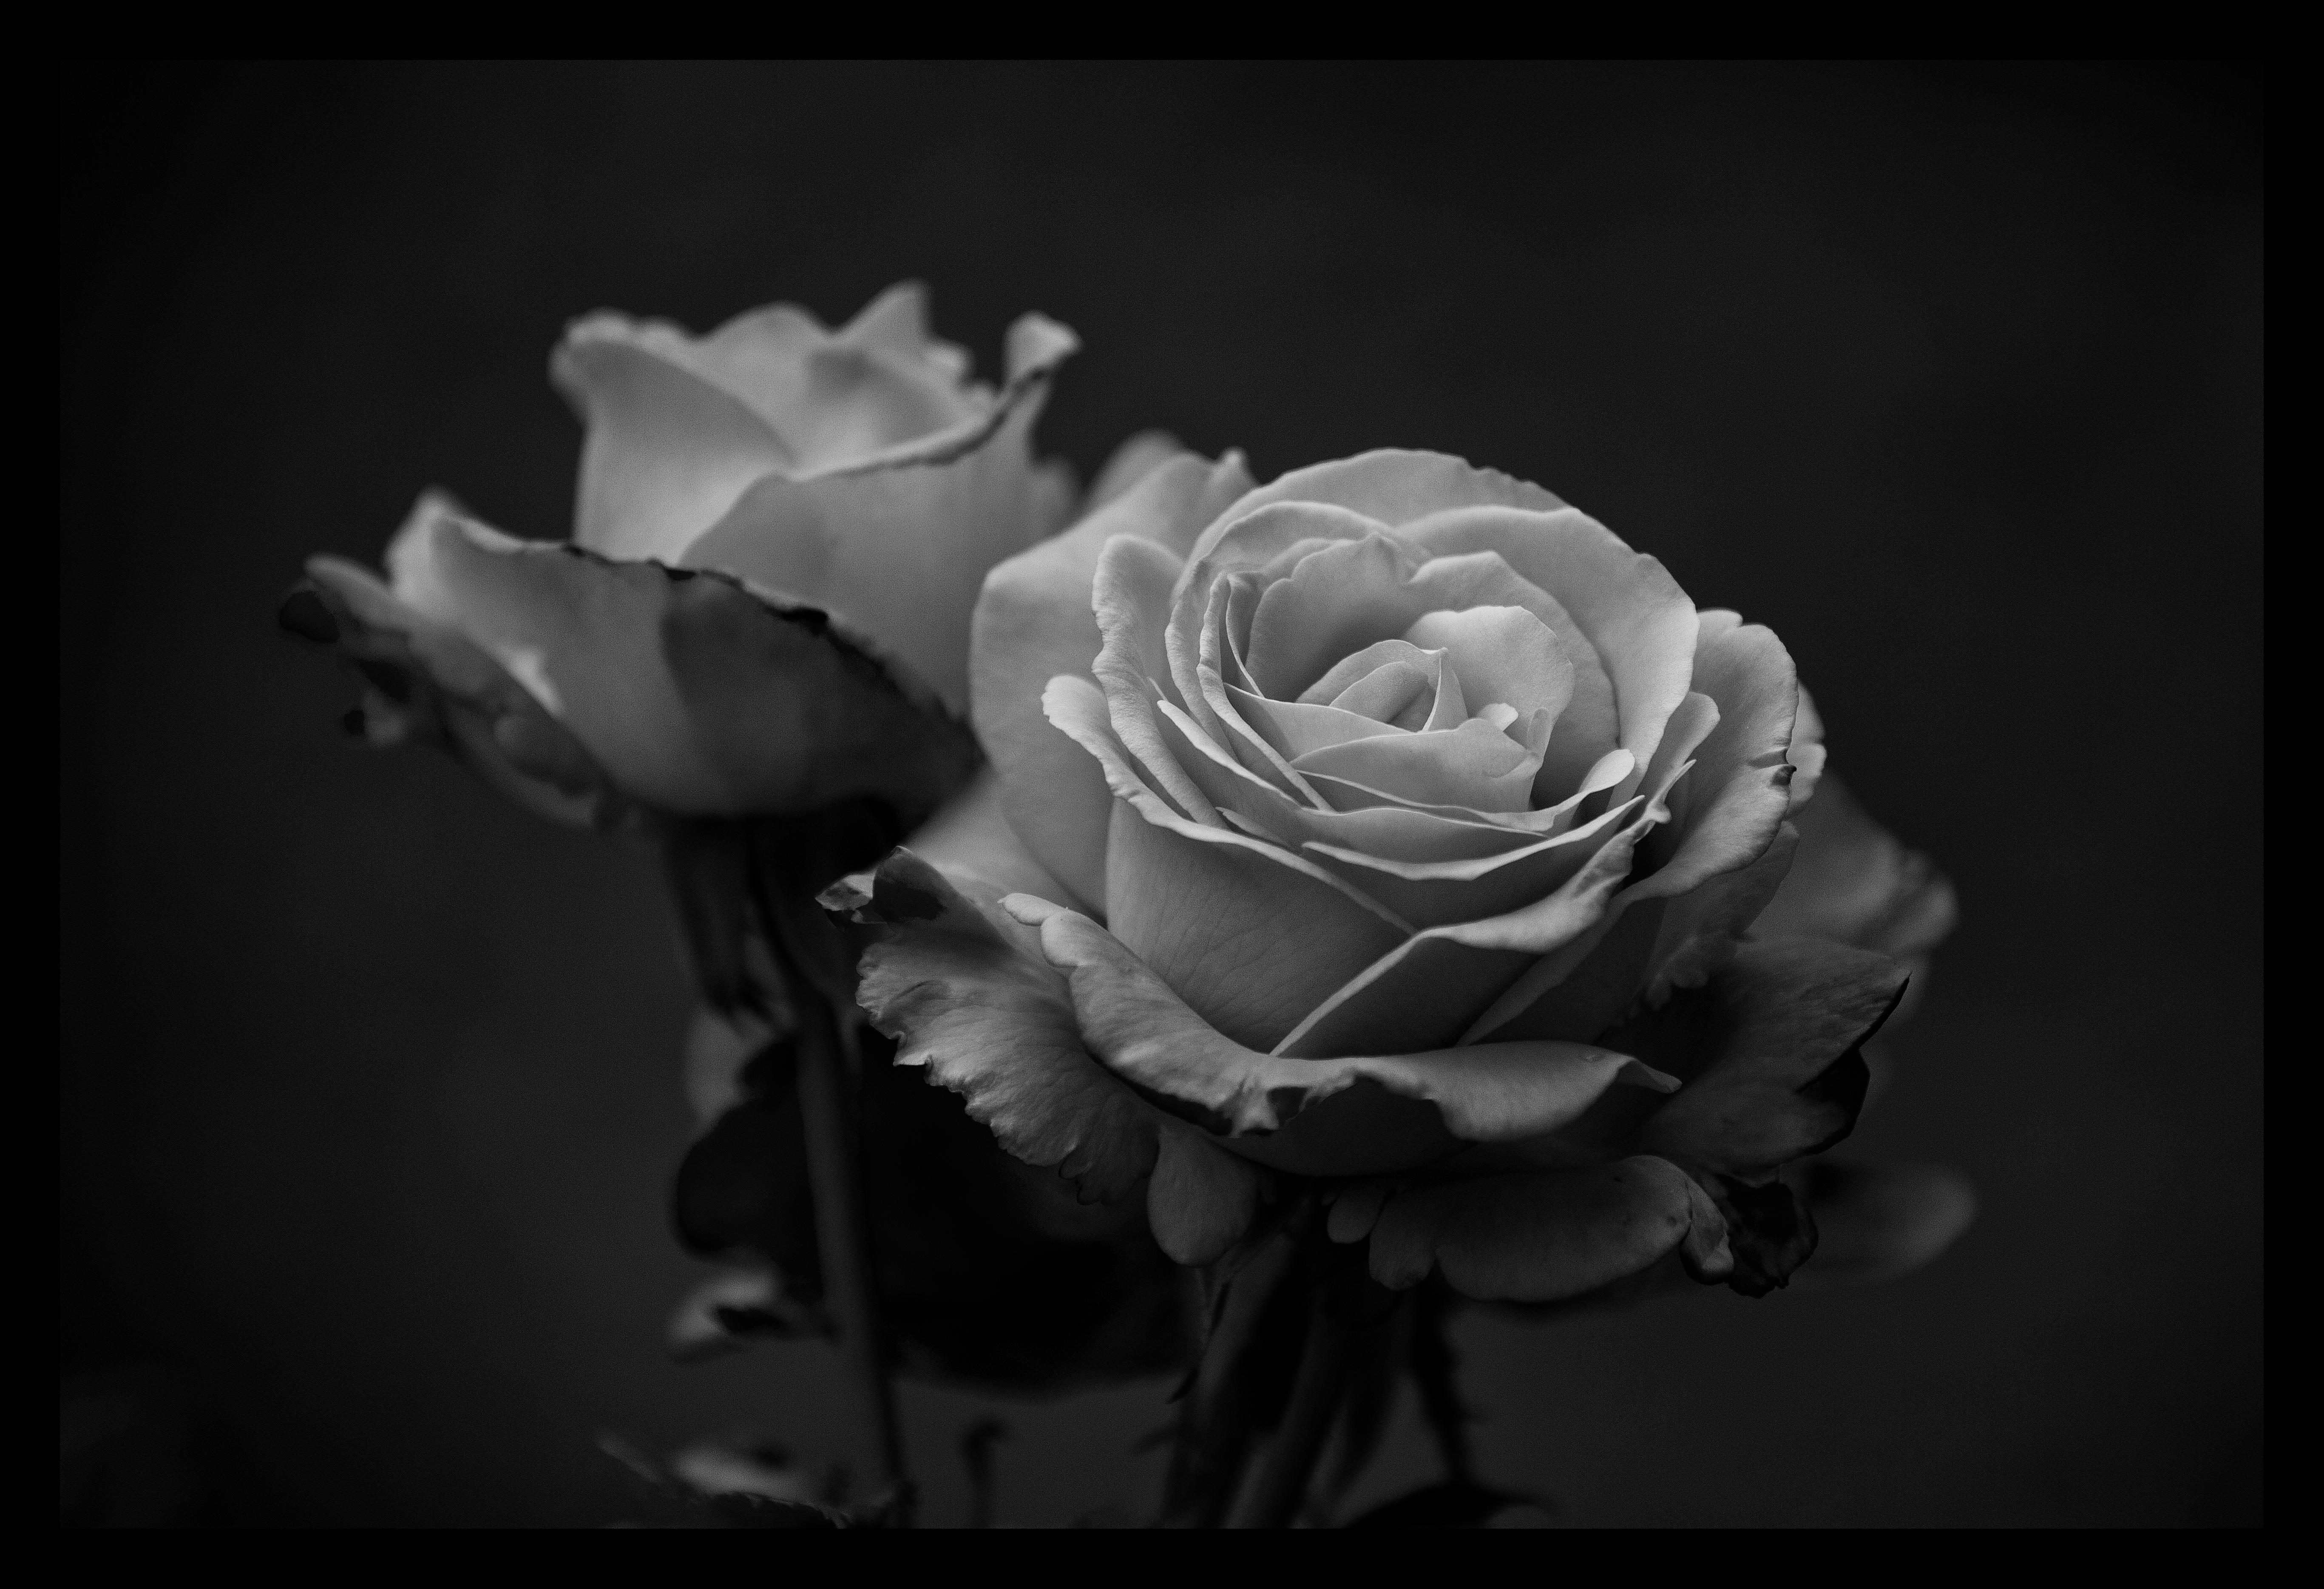 Blacknwhite Roses By Sloorth On Deviantart